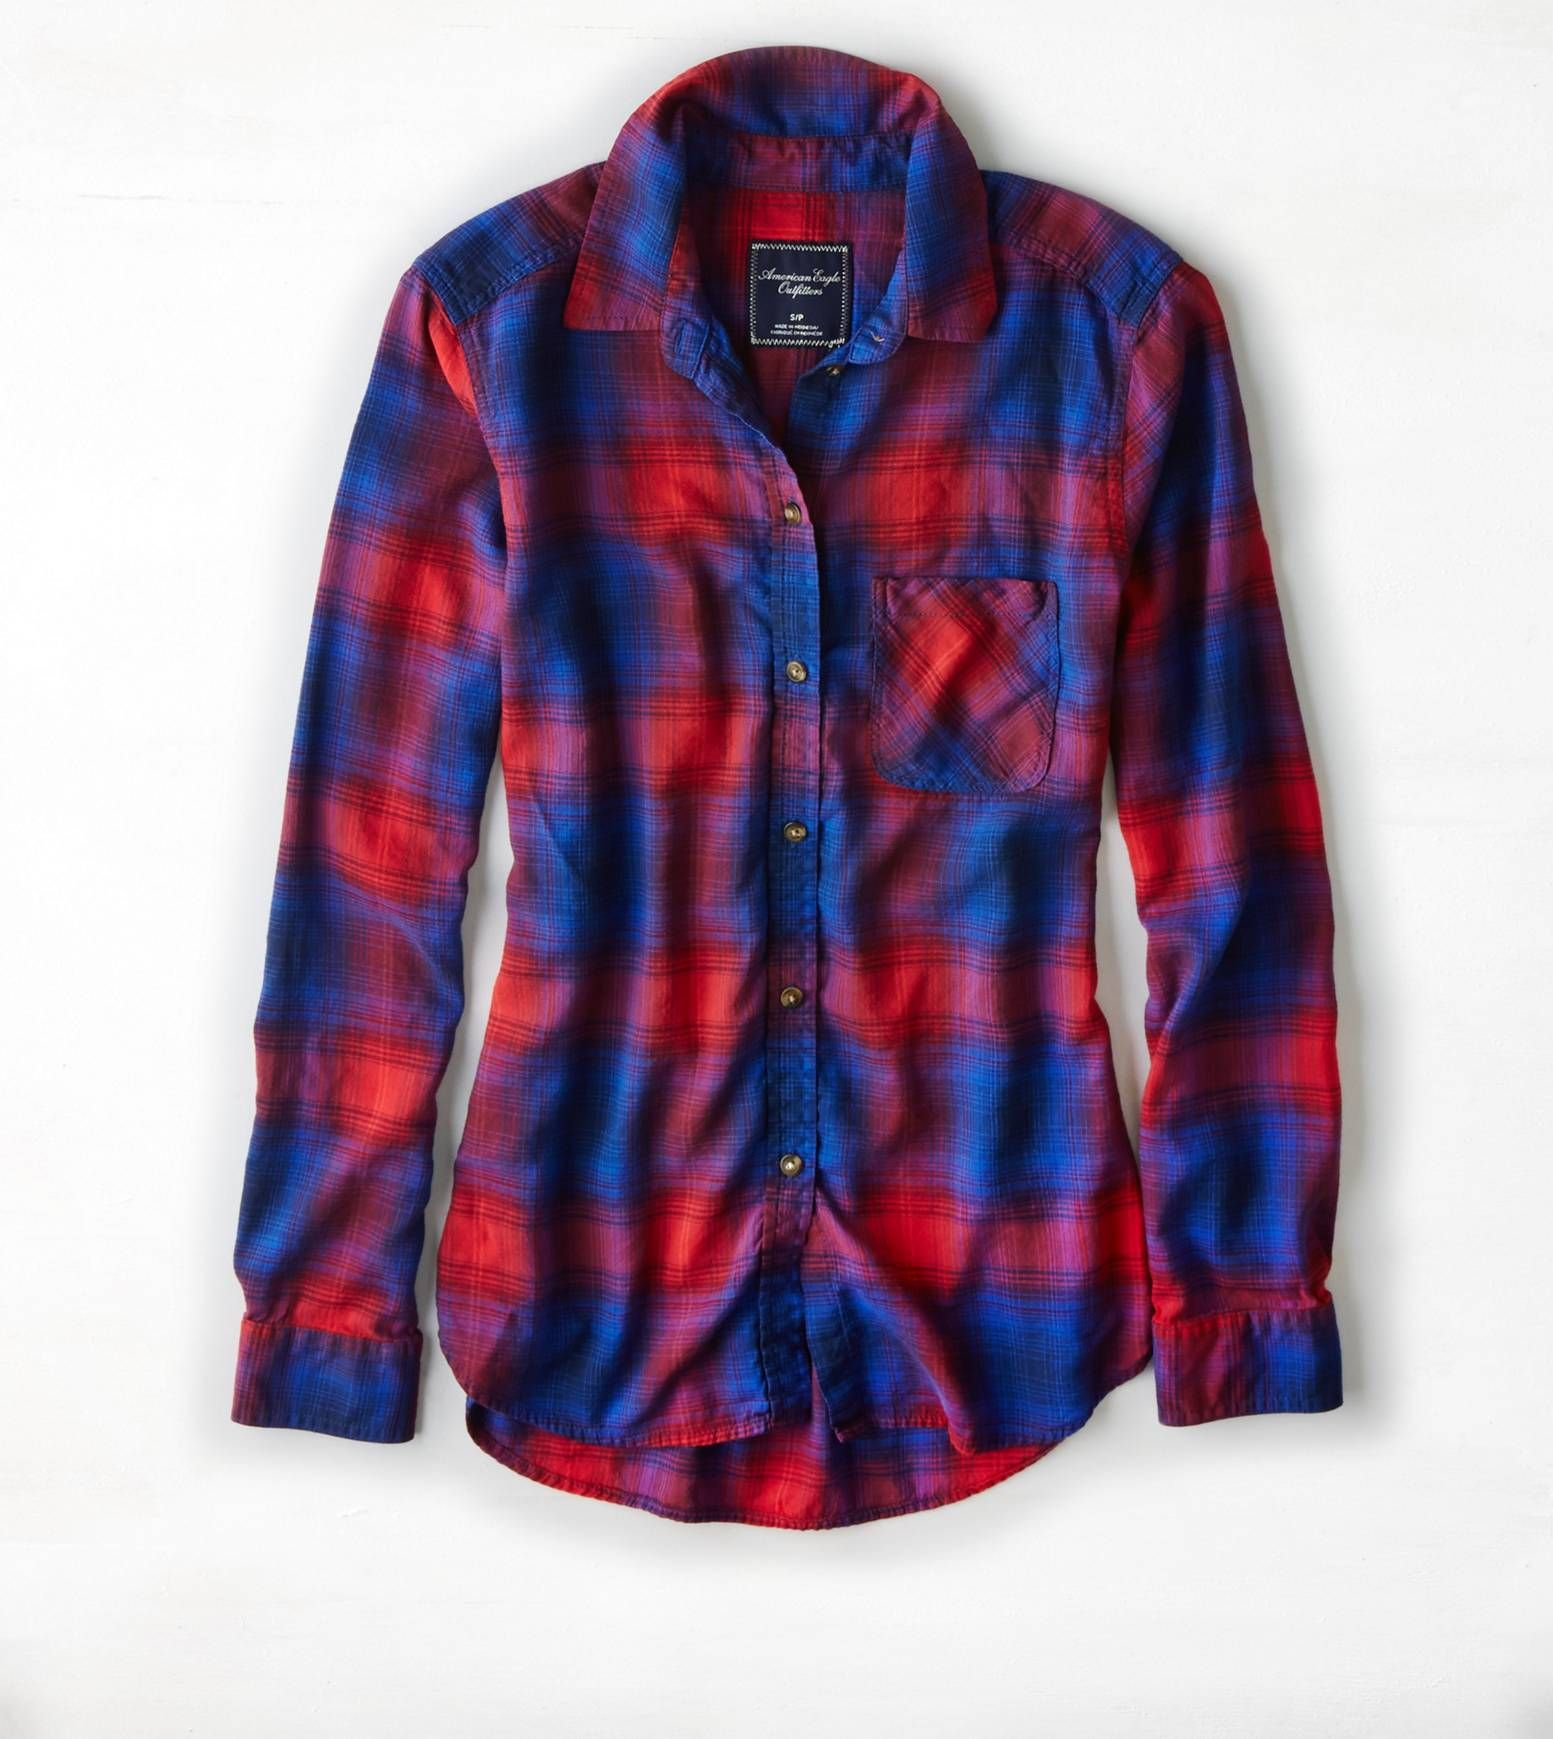 Flannel under shirt  Plaid Boyfriend Shirt  Products I Love  Pinterest  Plaid